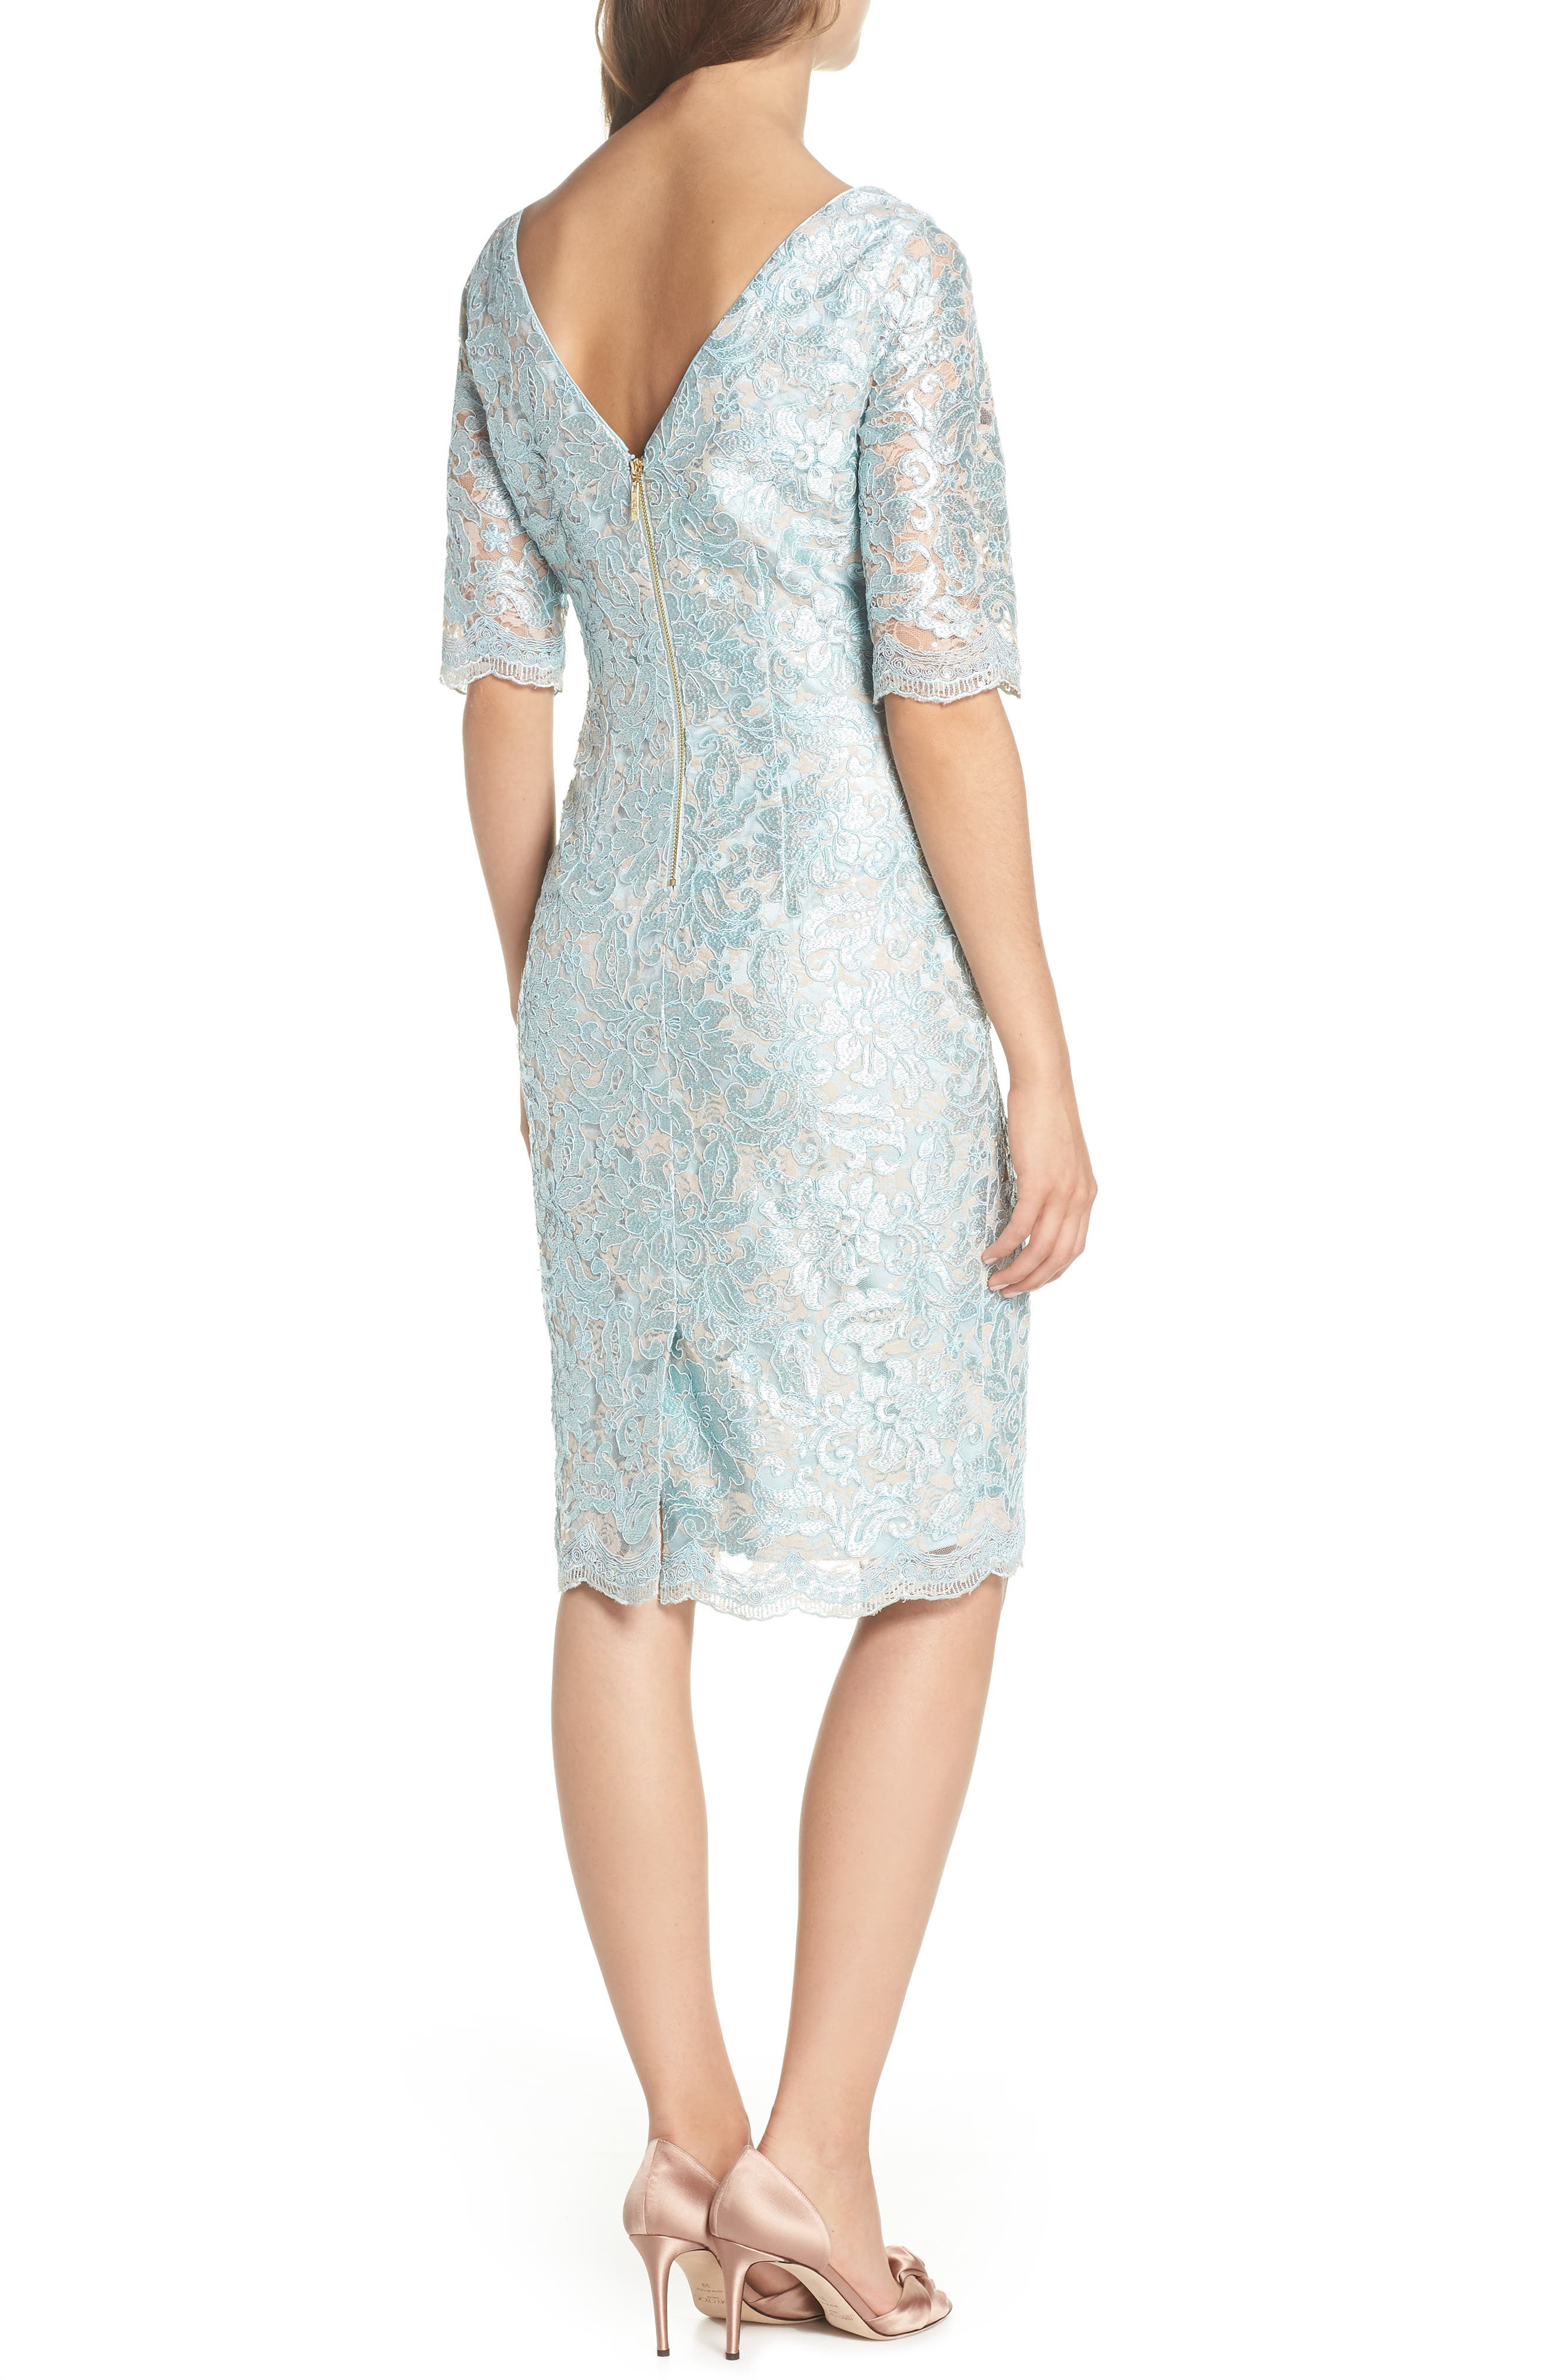 ELIZA J,                             Lace Sheath Dress,                             Alternate thumbnail 2, color,                             330